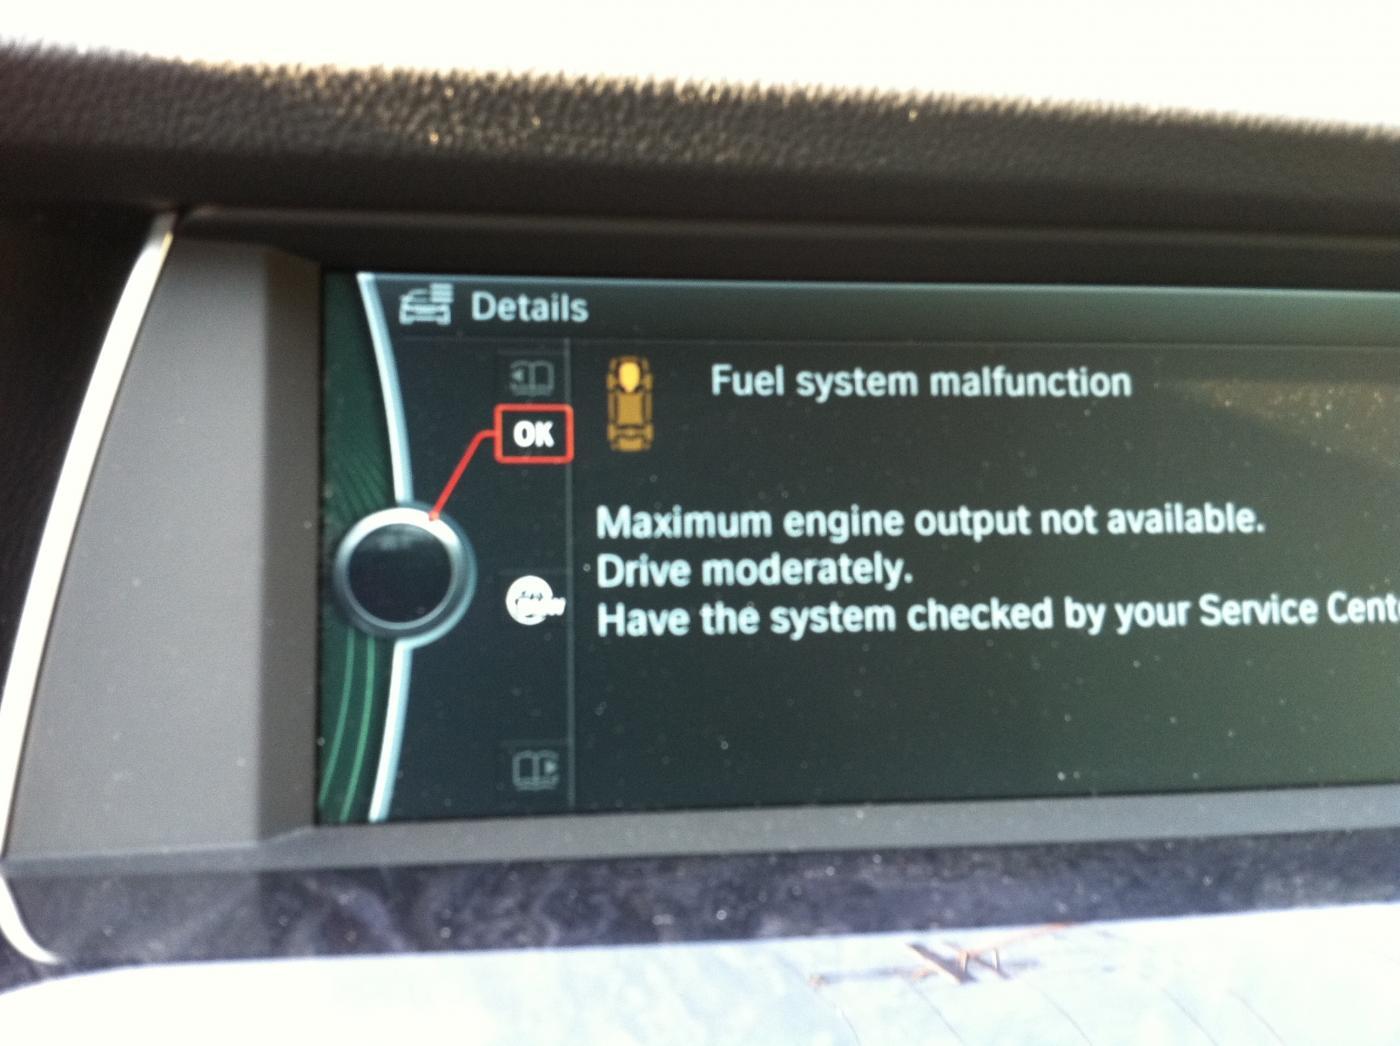 Transmission Fault Bmw 750li.BMW E46 Oxygen Sensor Replacement BMW ...